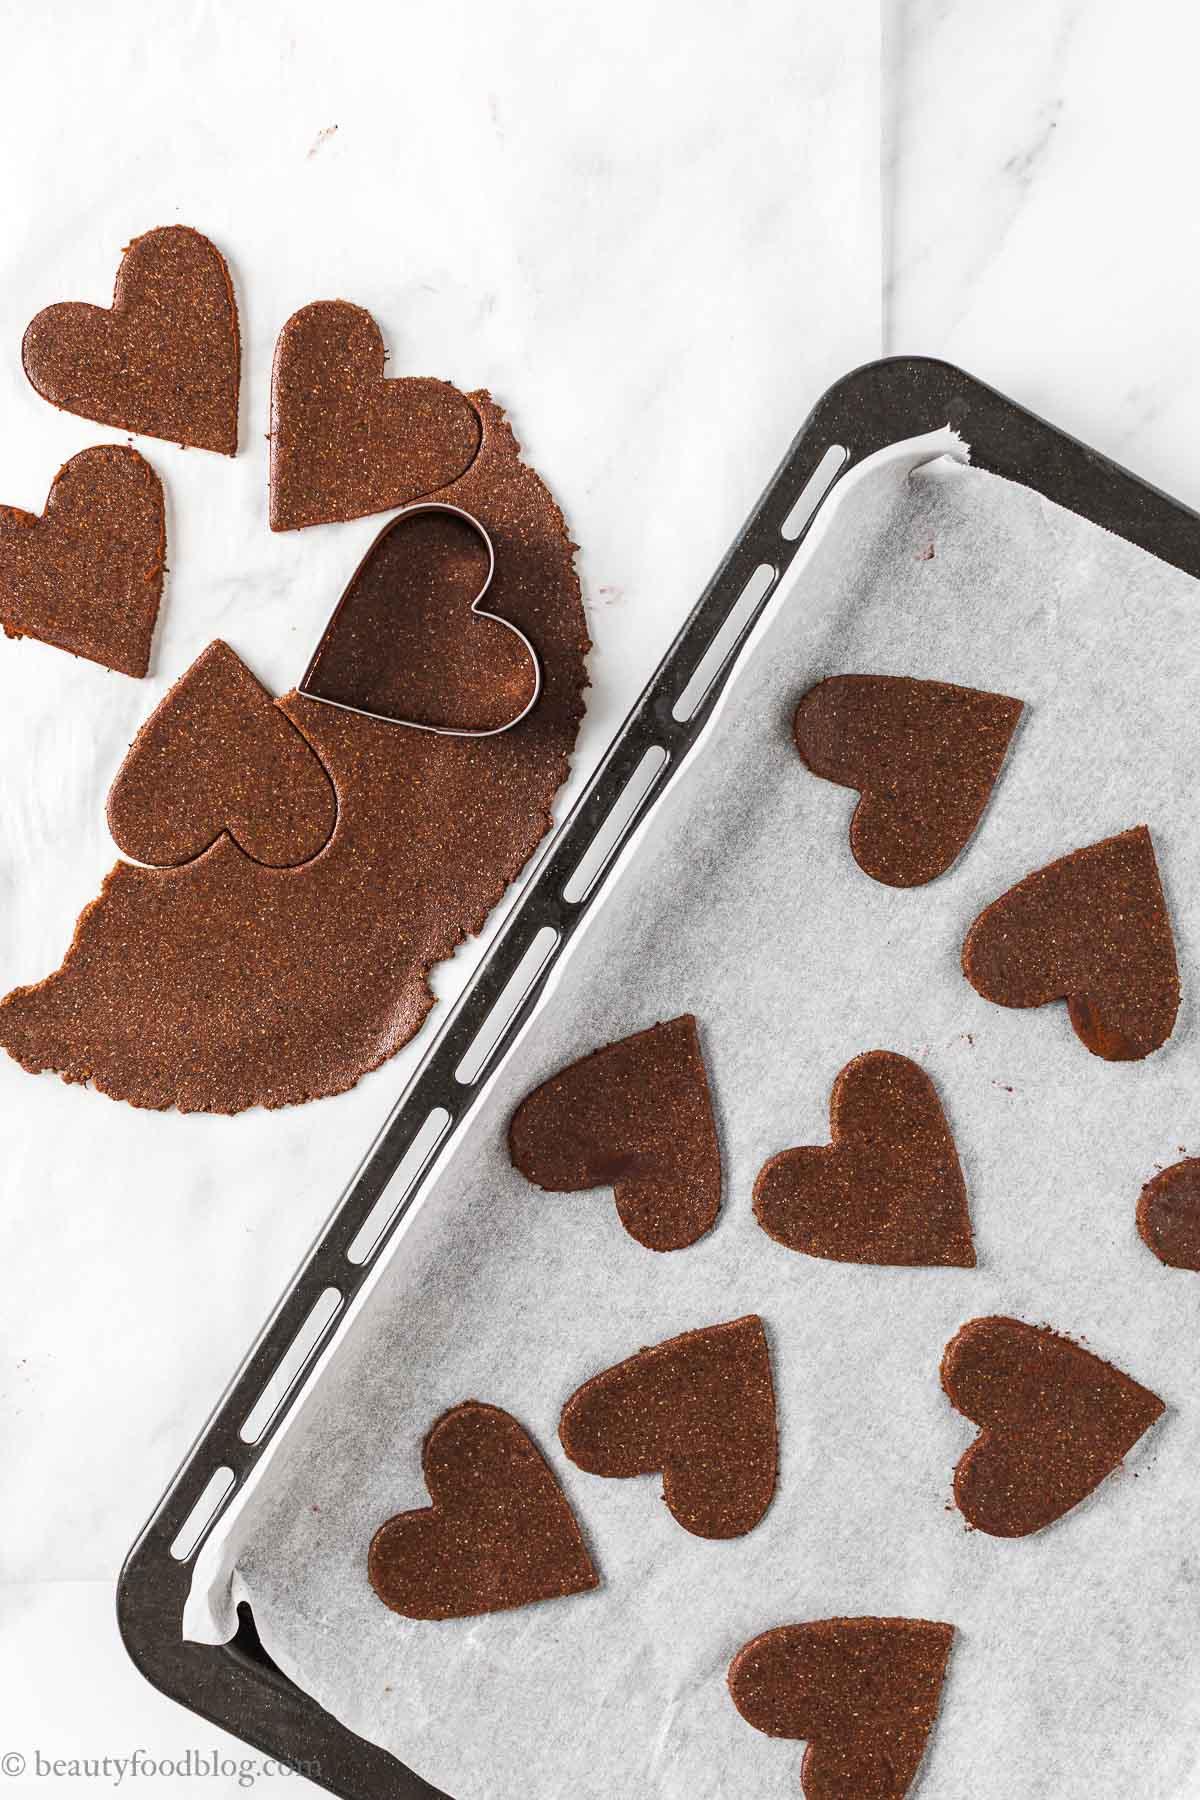 come fare i biscotti Frollini vegani senza glutine al cacao e caffè gluten-free vegan chocolate almond cookies